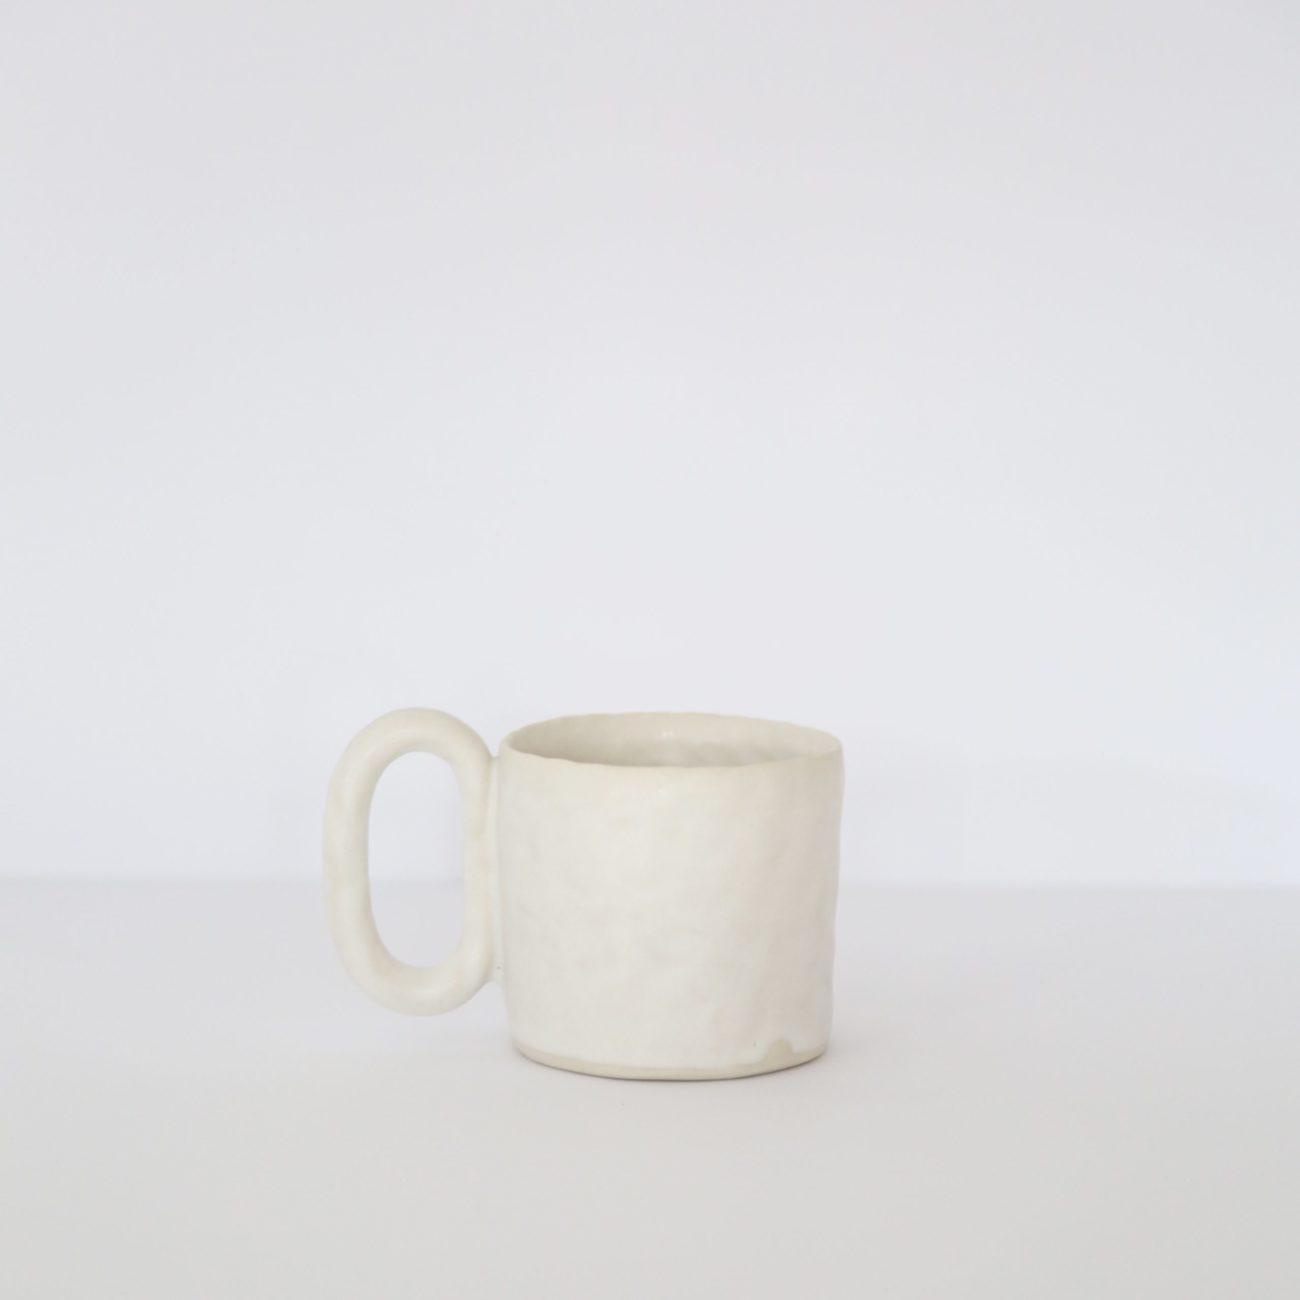 Large Ceramic Mug, Warm White